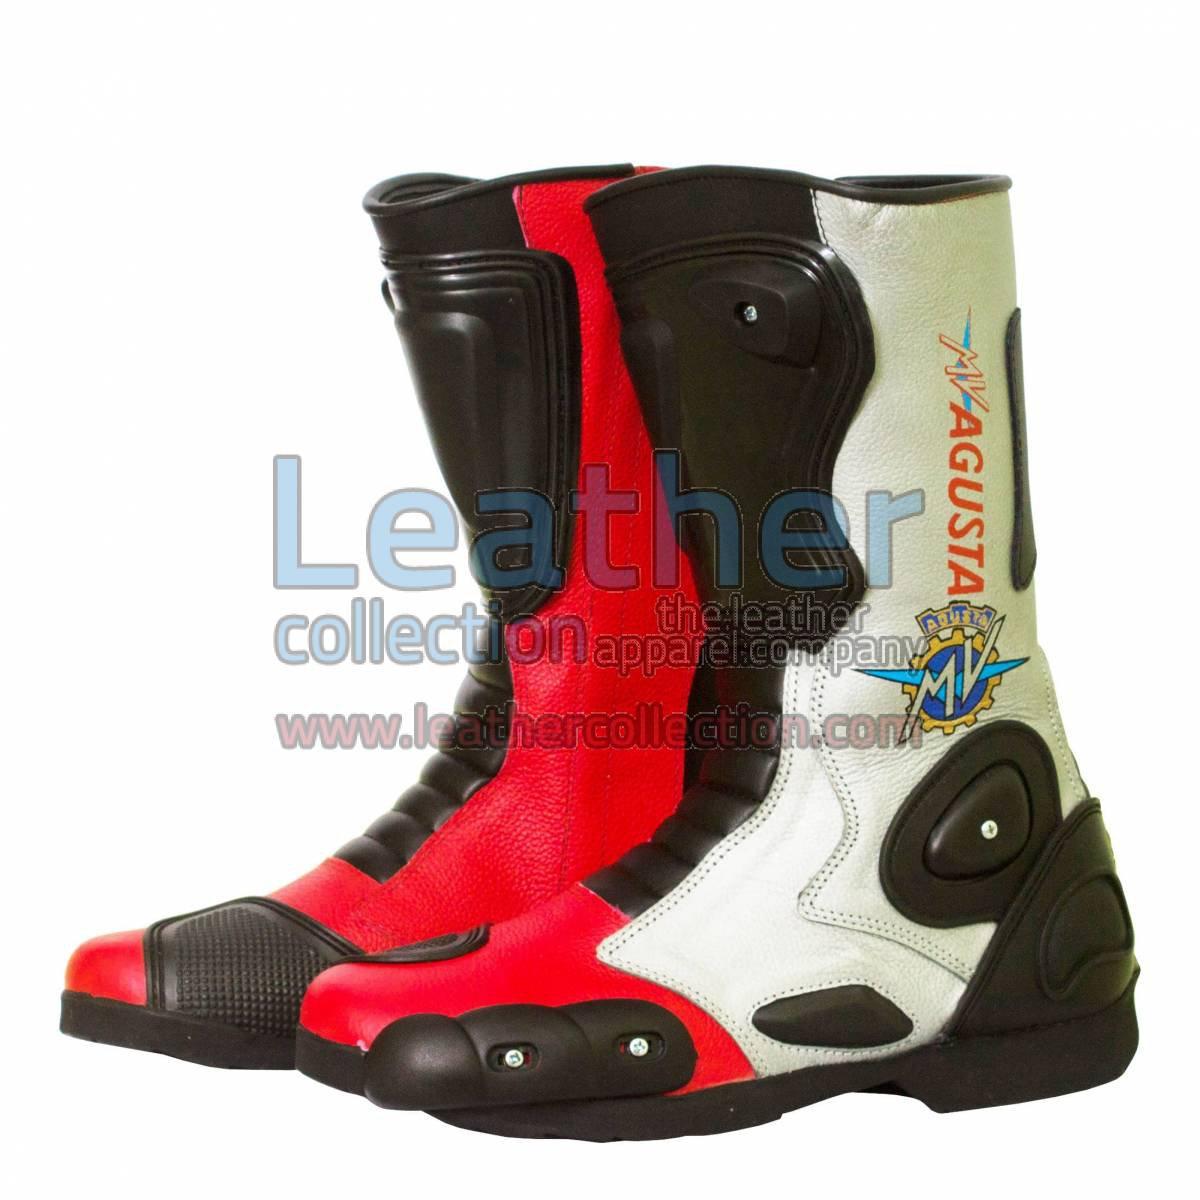 MV Agusta Leather Biker Boots